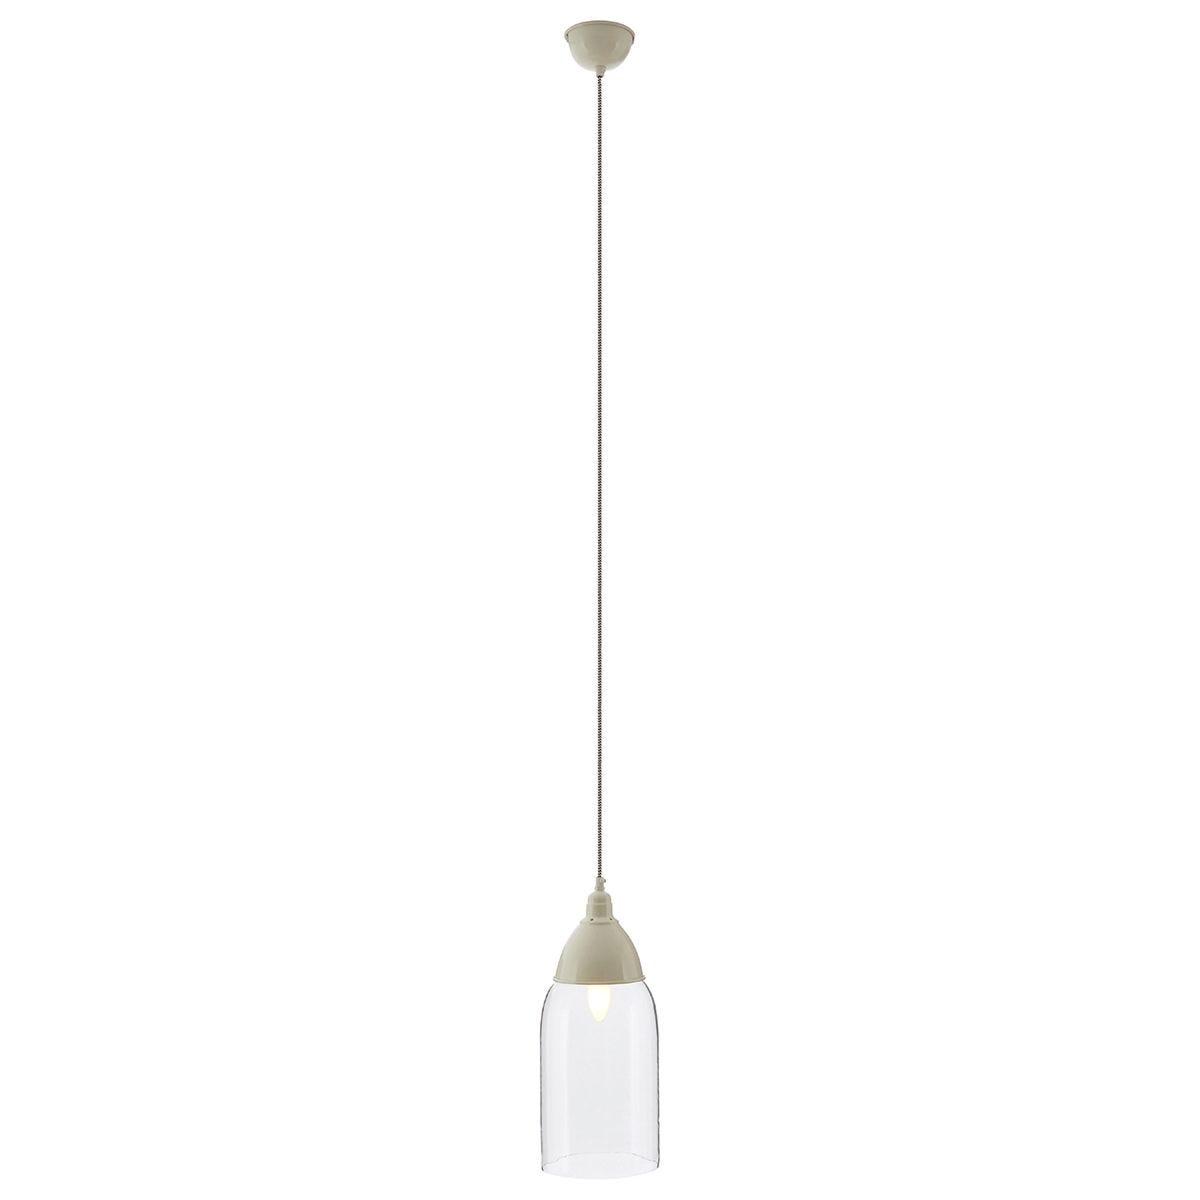 Premier Housewares Oslo Pendant Light in Glass/Iron - White